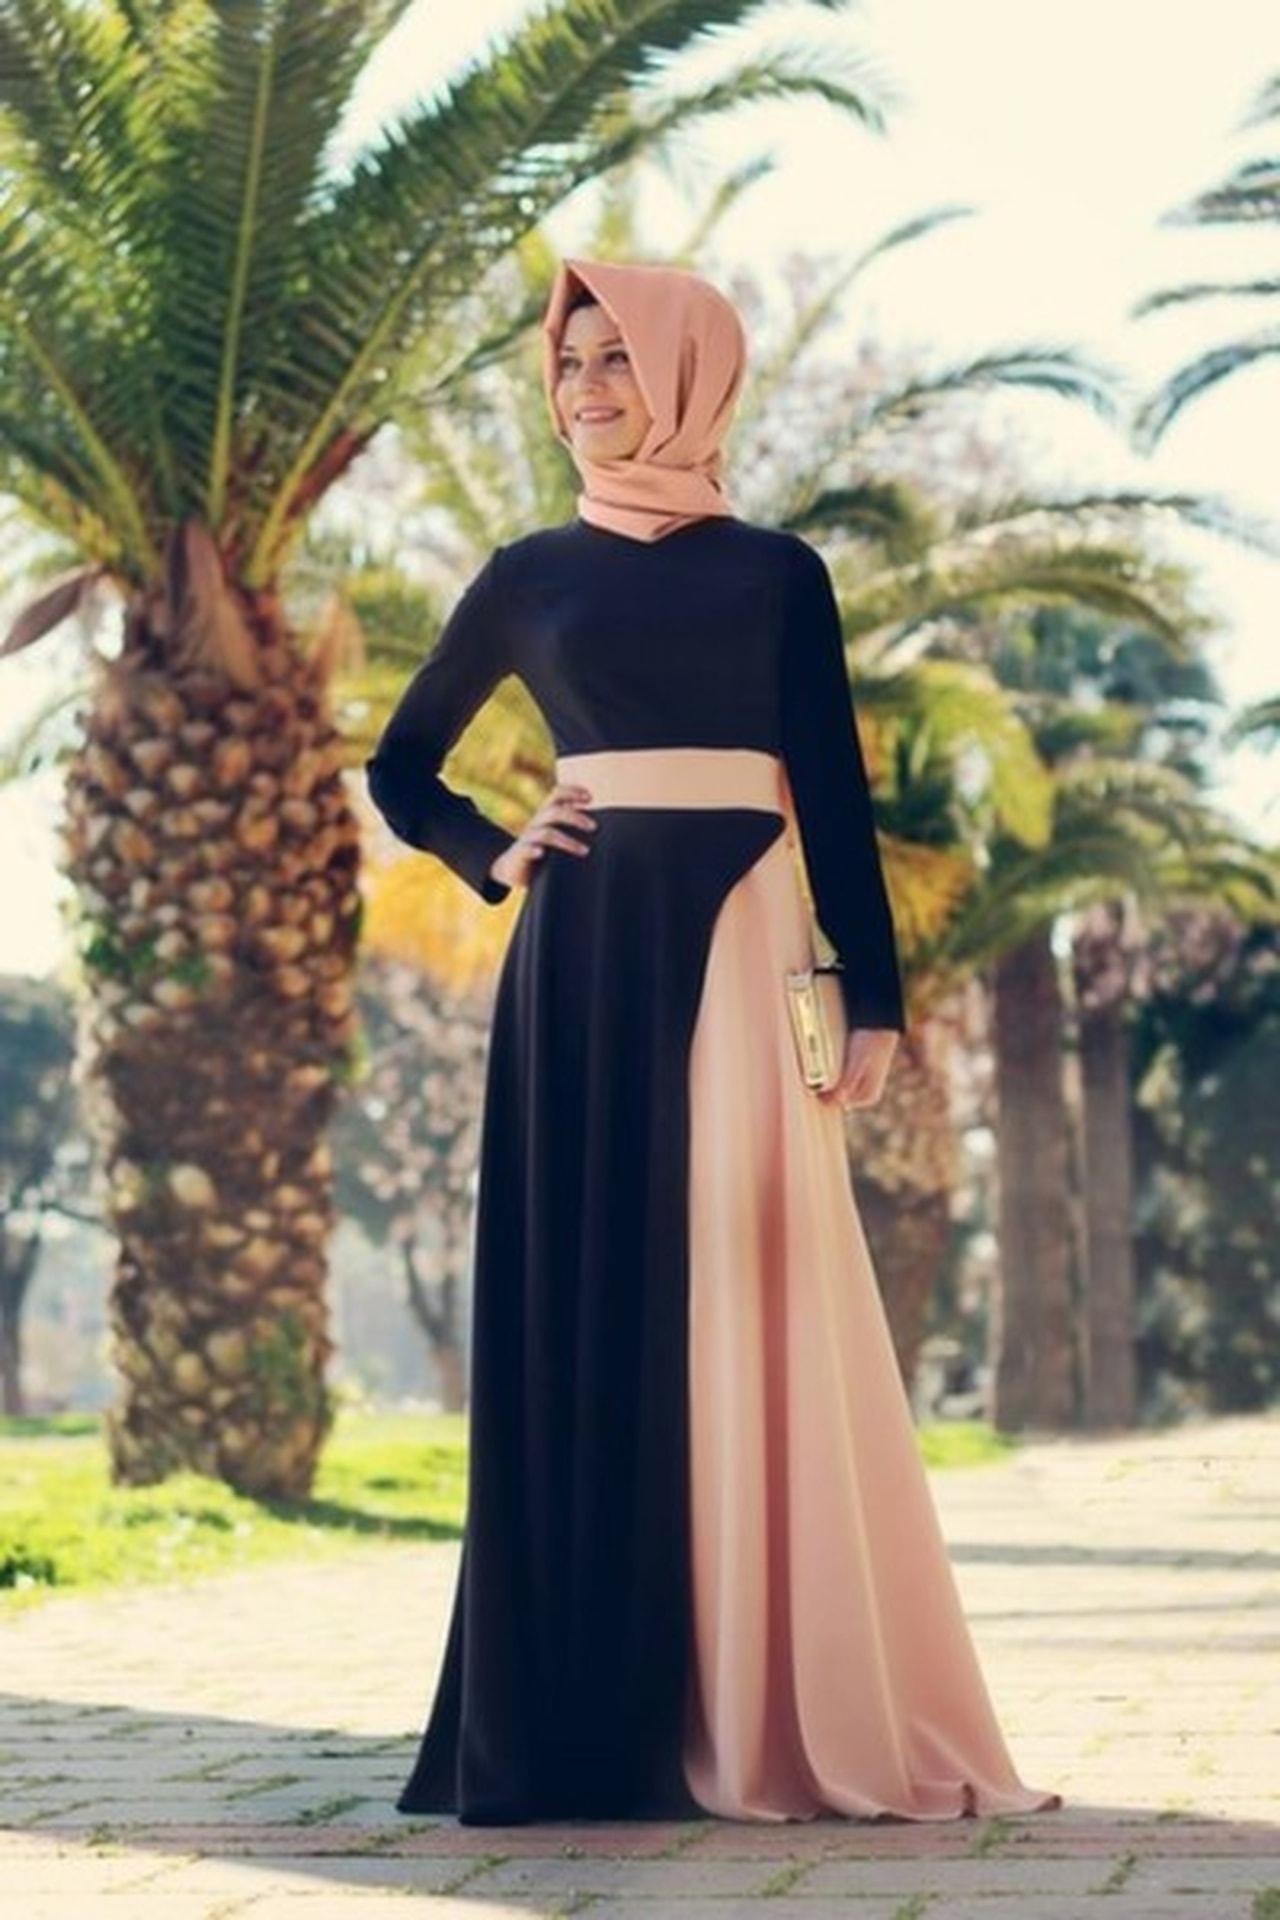 بالصور صور فساتين تركي , اجمل موديلات الفساتين التركي 1839 9